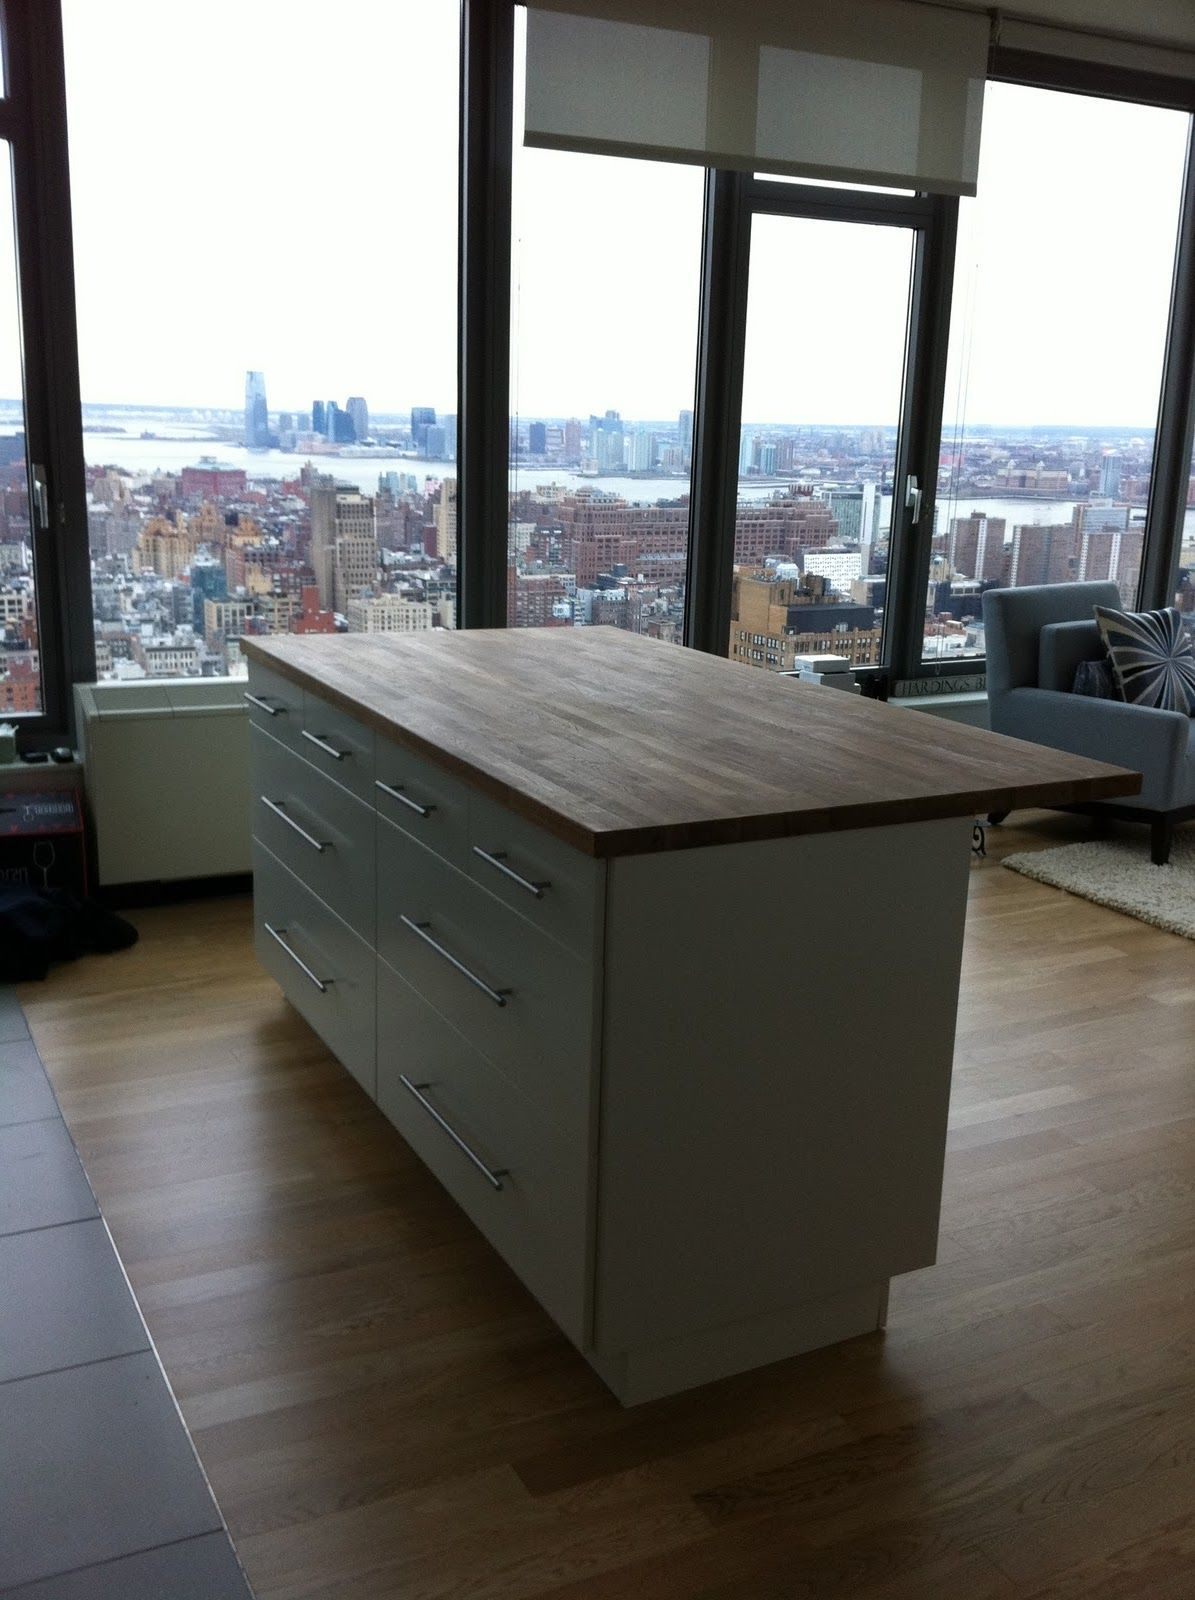 IKEA Kitchen Islands | ... Assembly Blog: Home Improvement - IKEA ...